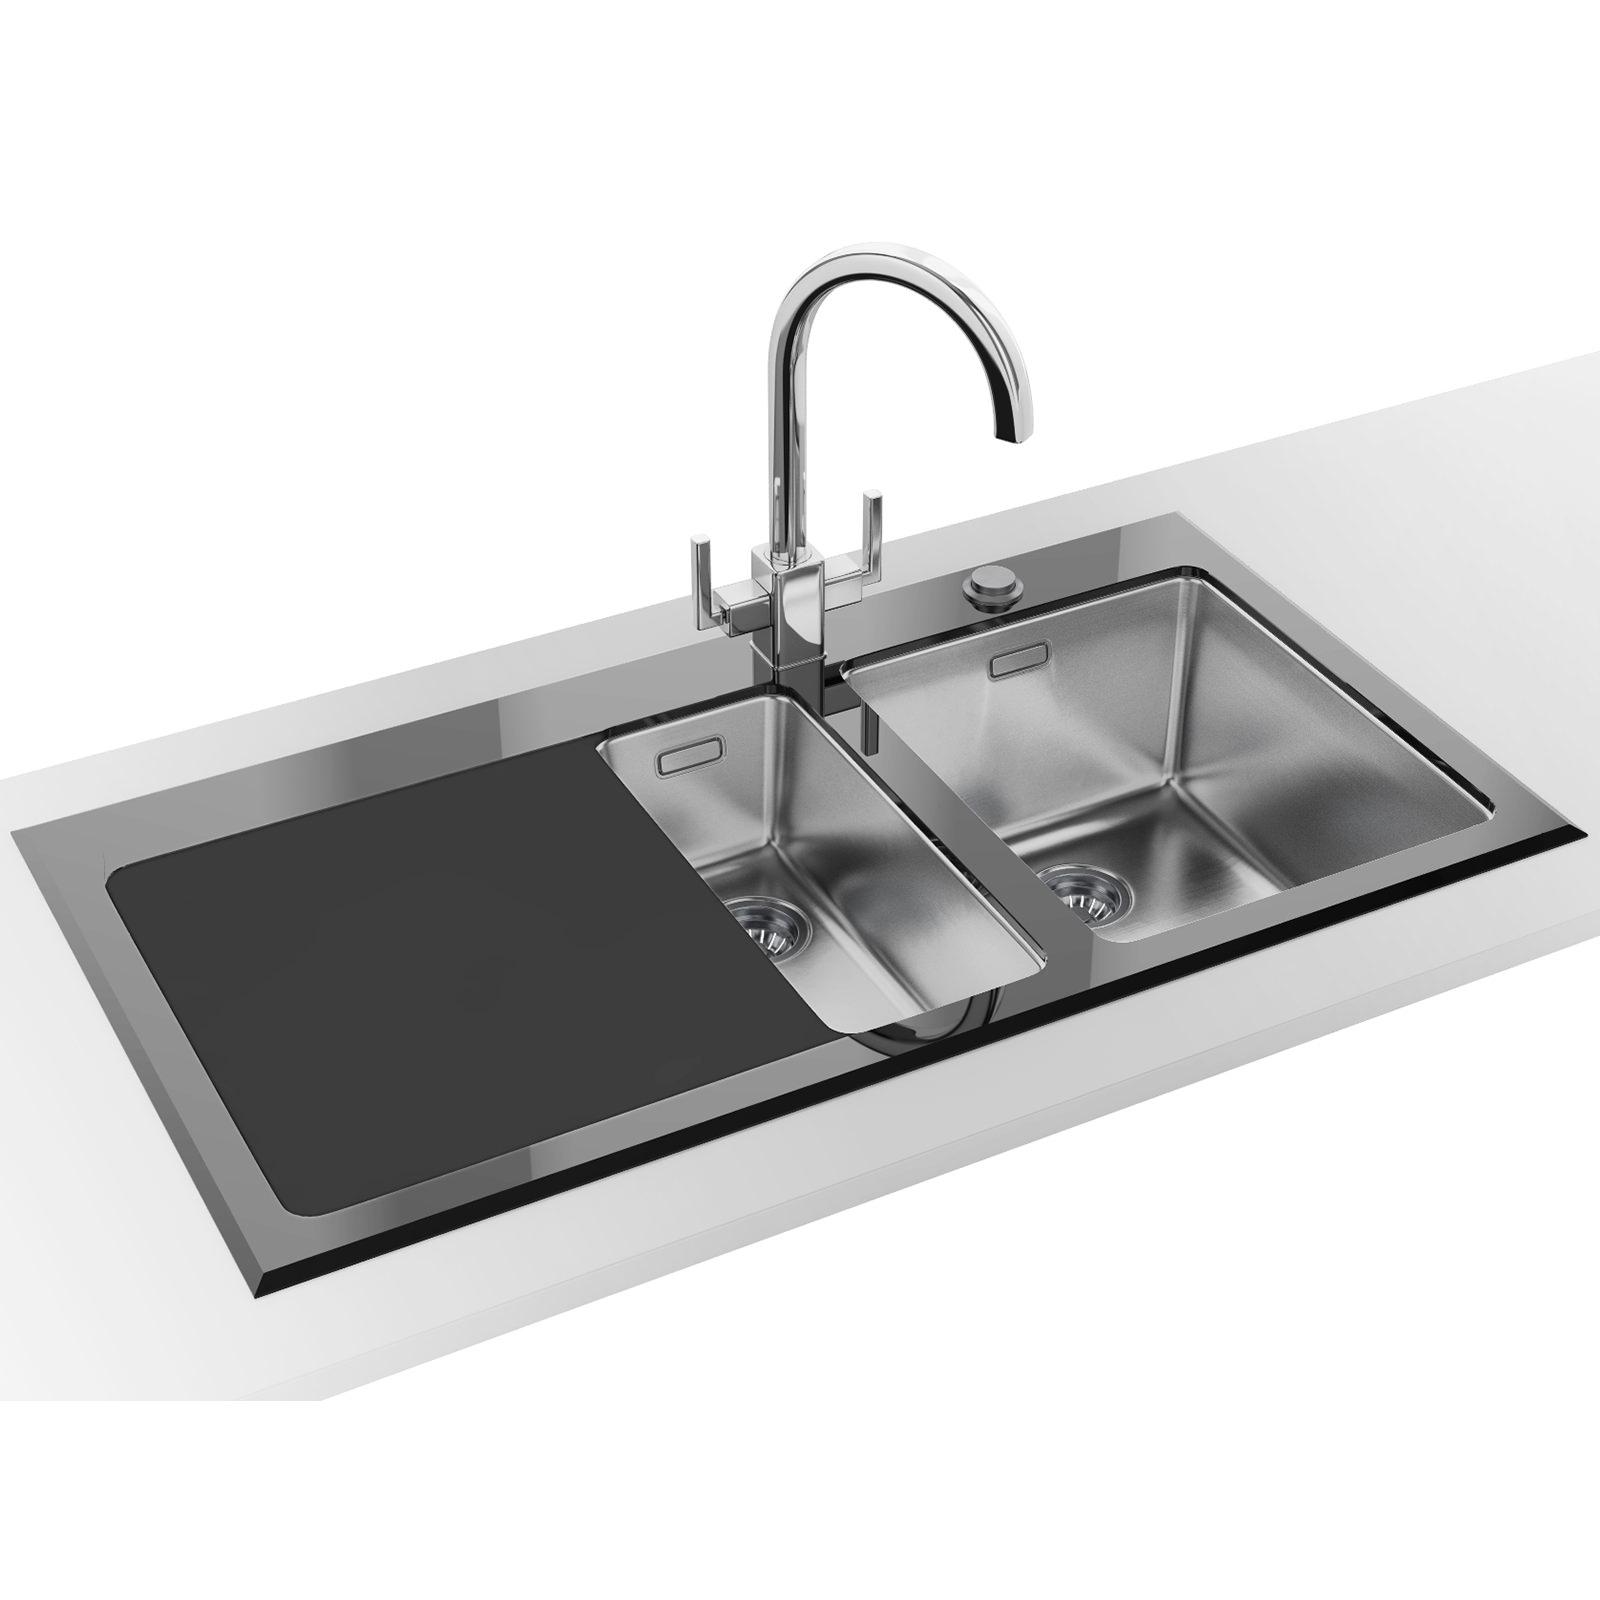 franco kitchen sinks moen faucet schematic franke kubus kbv 651 black glass 1 5 bowl inset